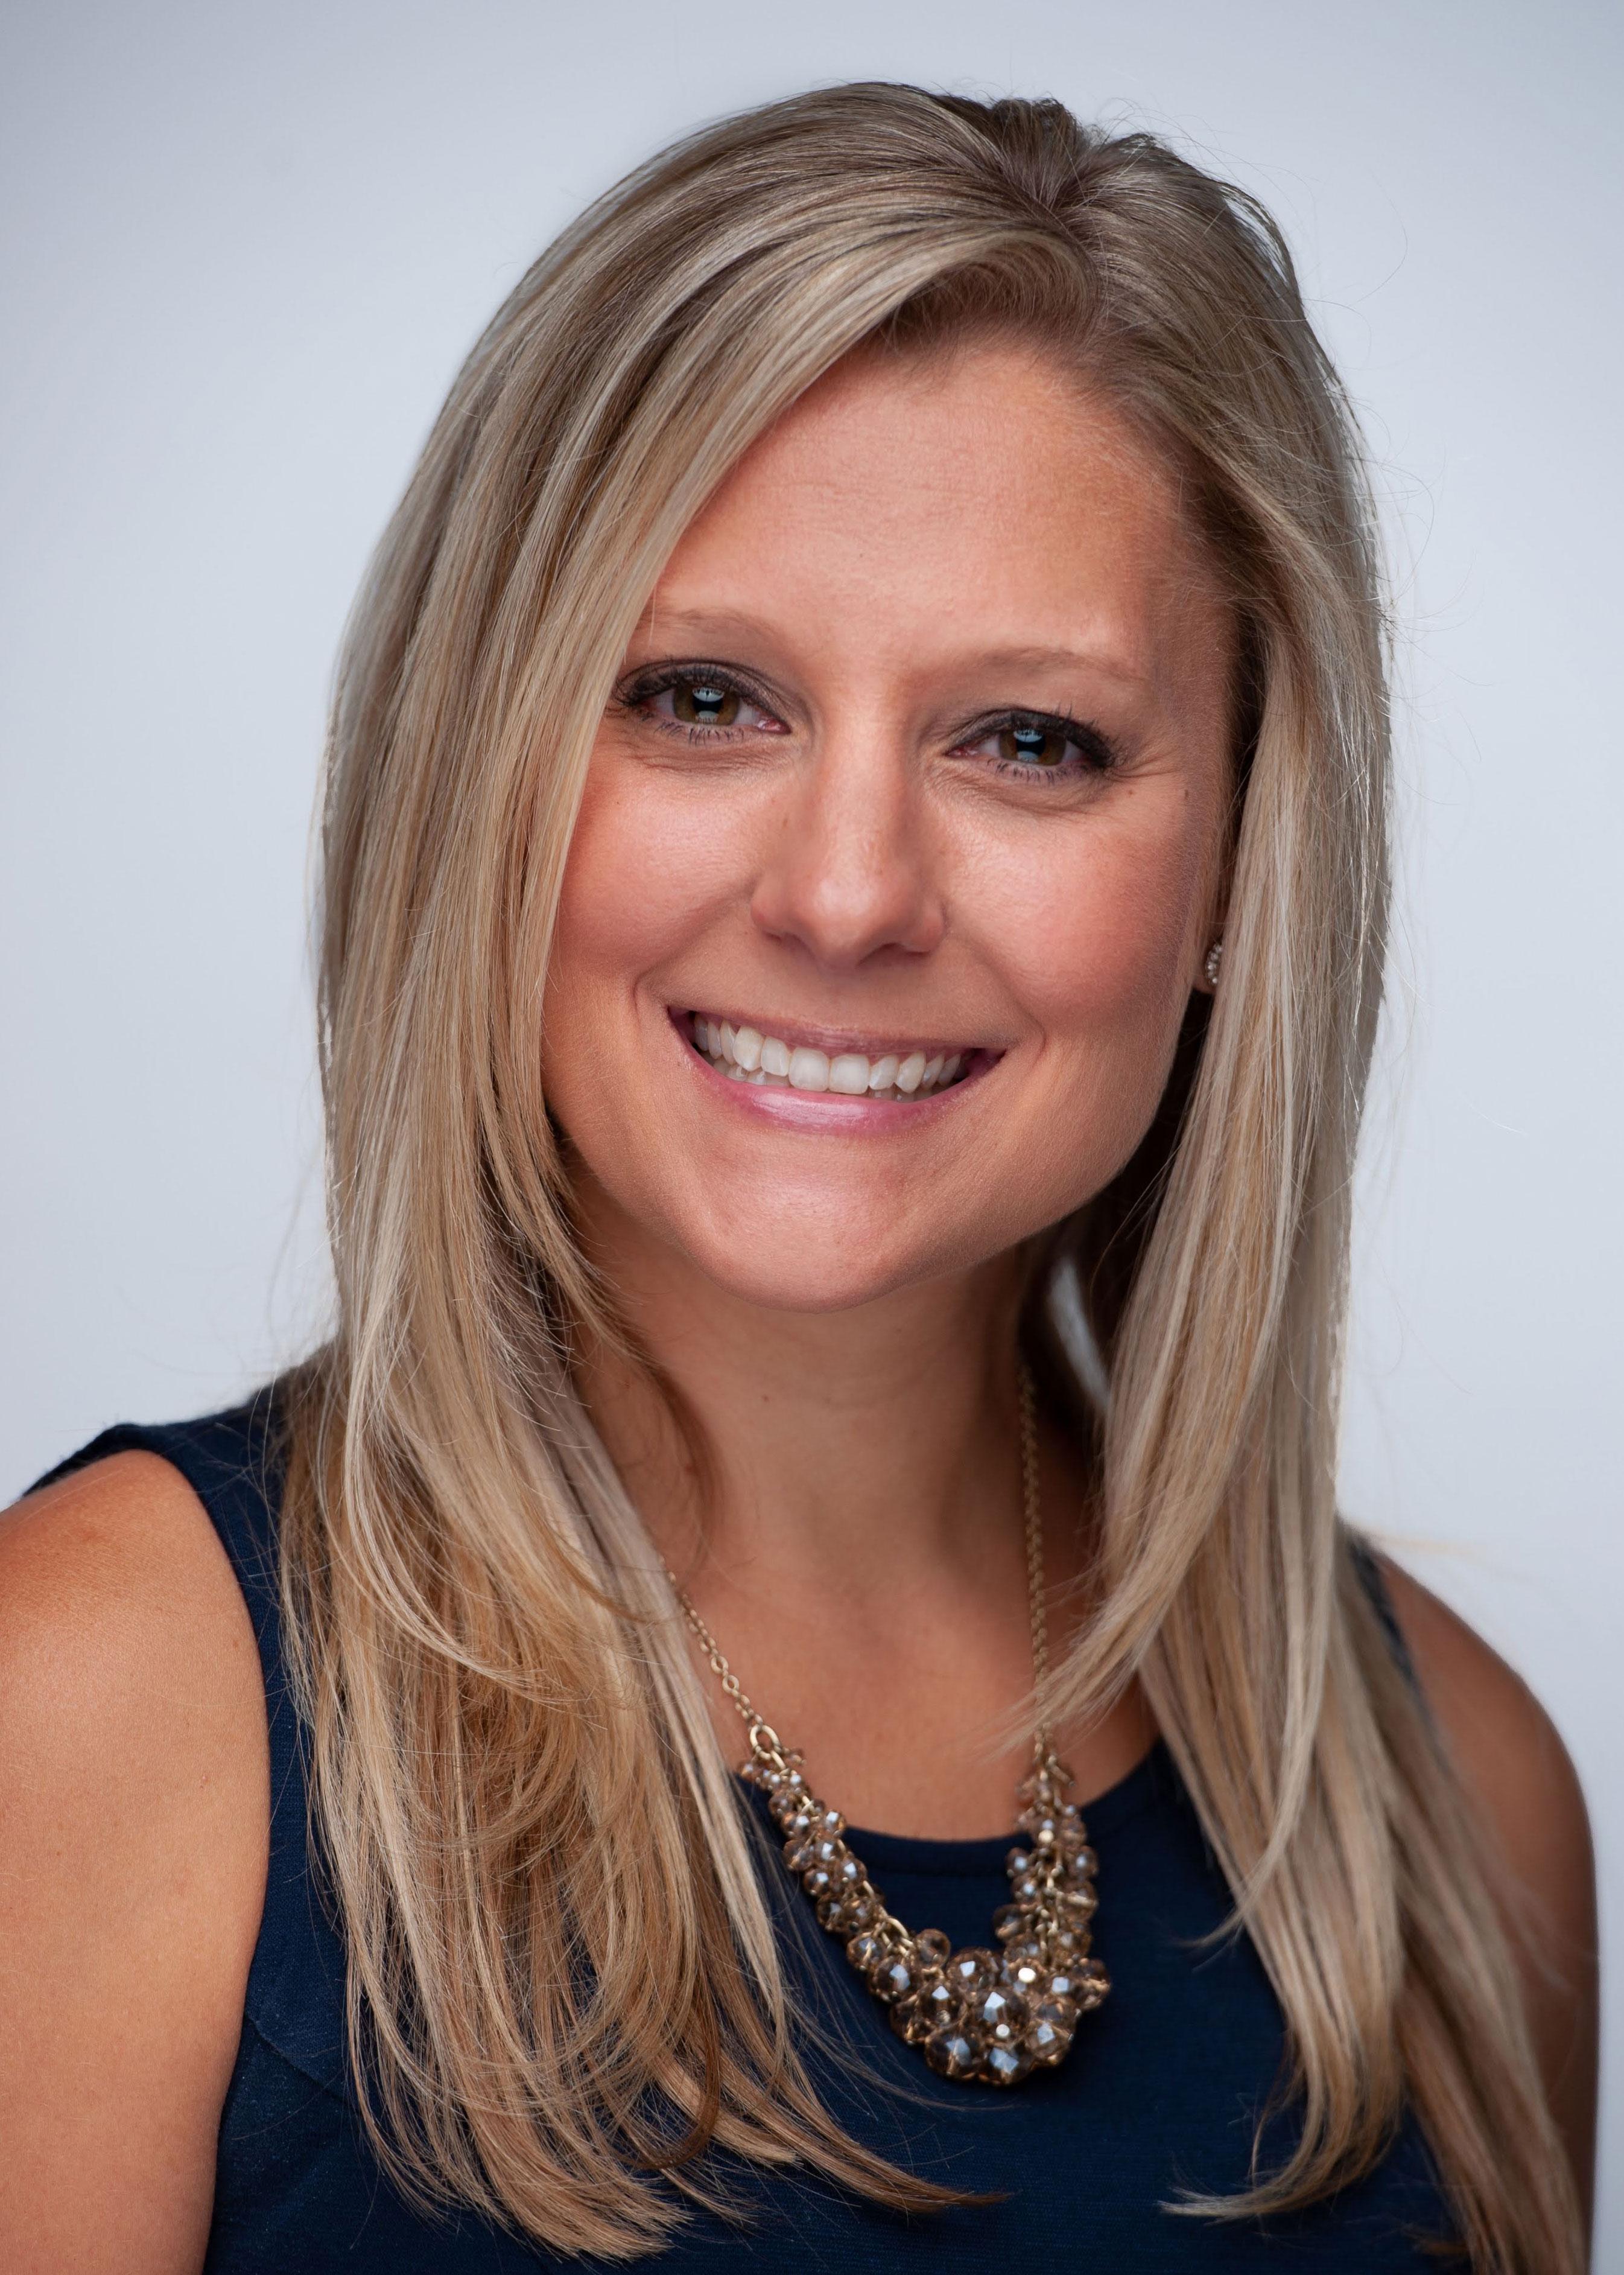 Jennifer Brodie